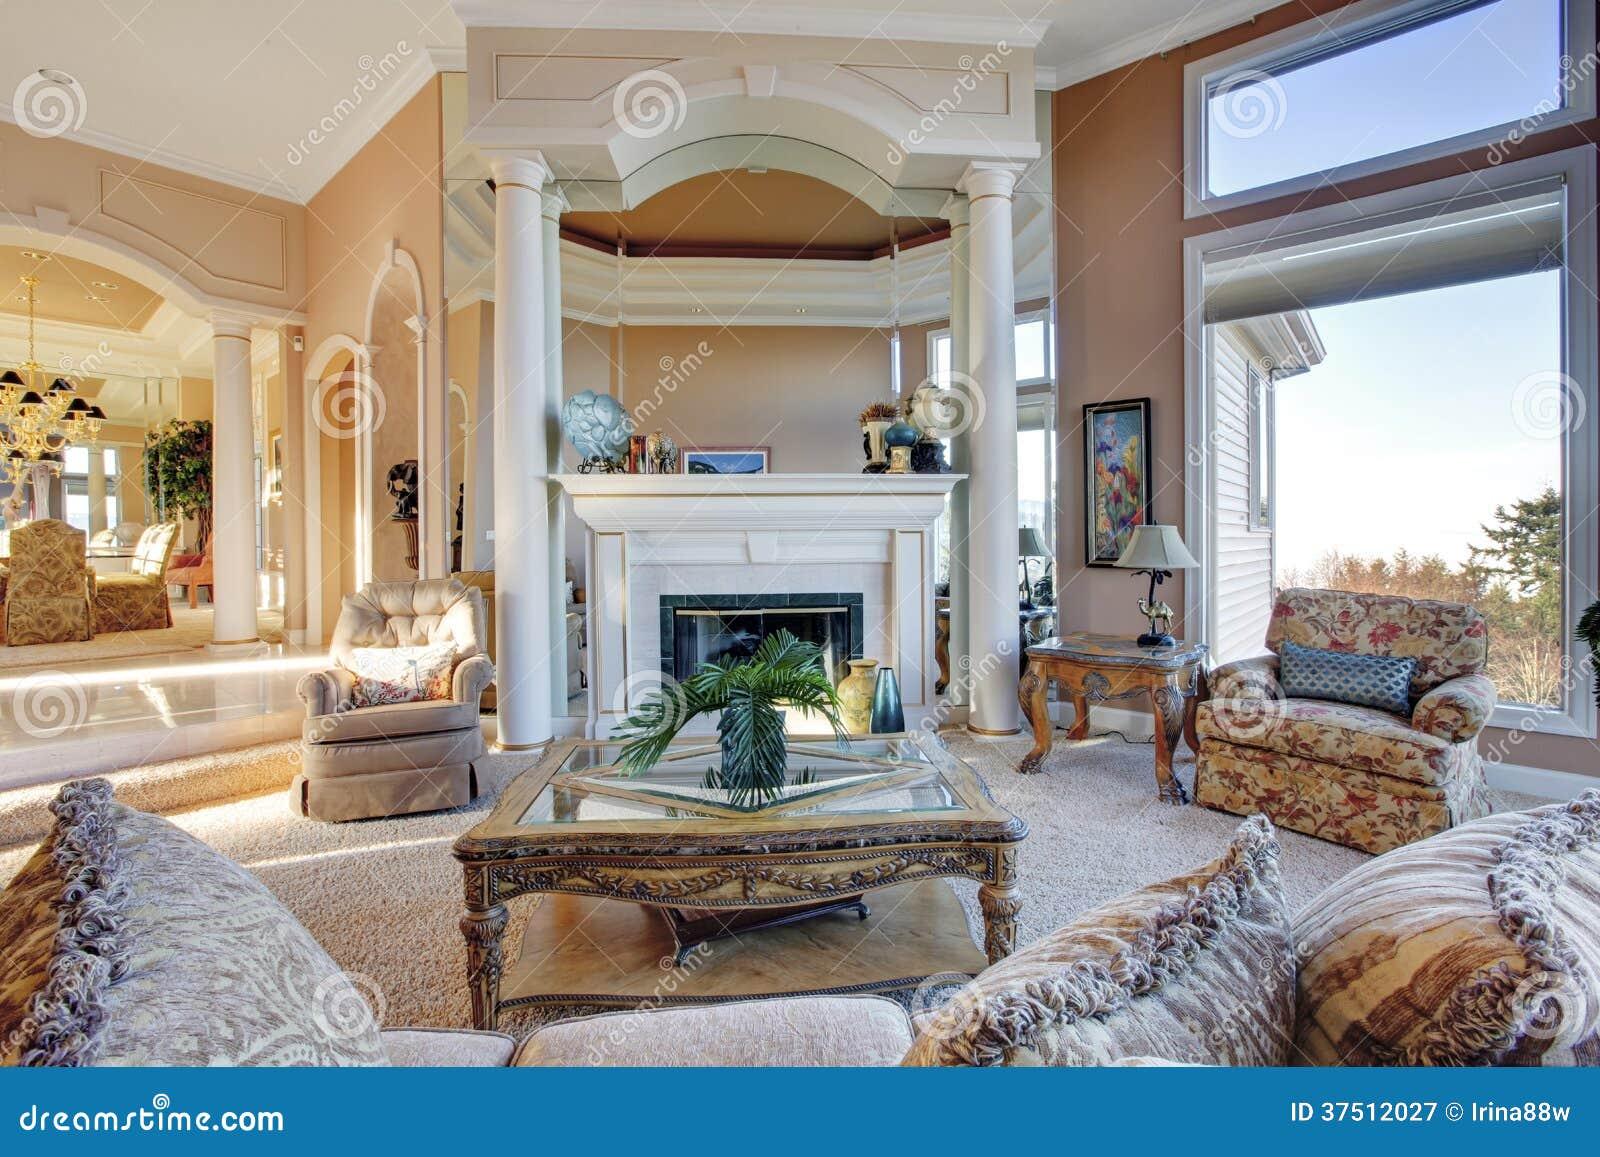 Rich Furniture Interior Design ~ Amazing rich interior with antique furniture royalty free